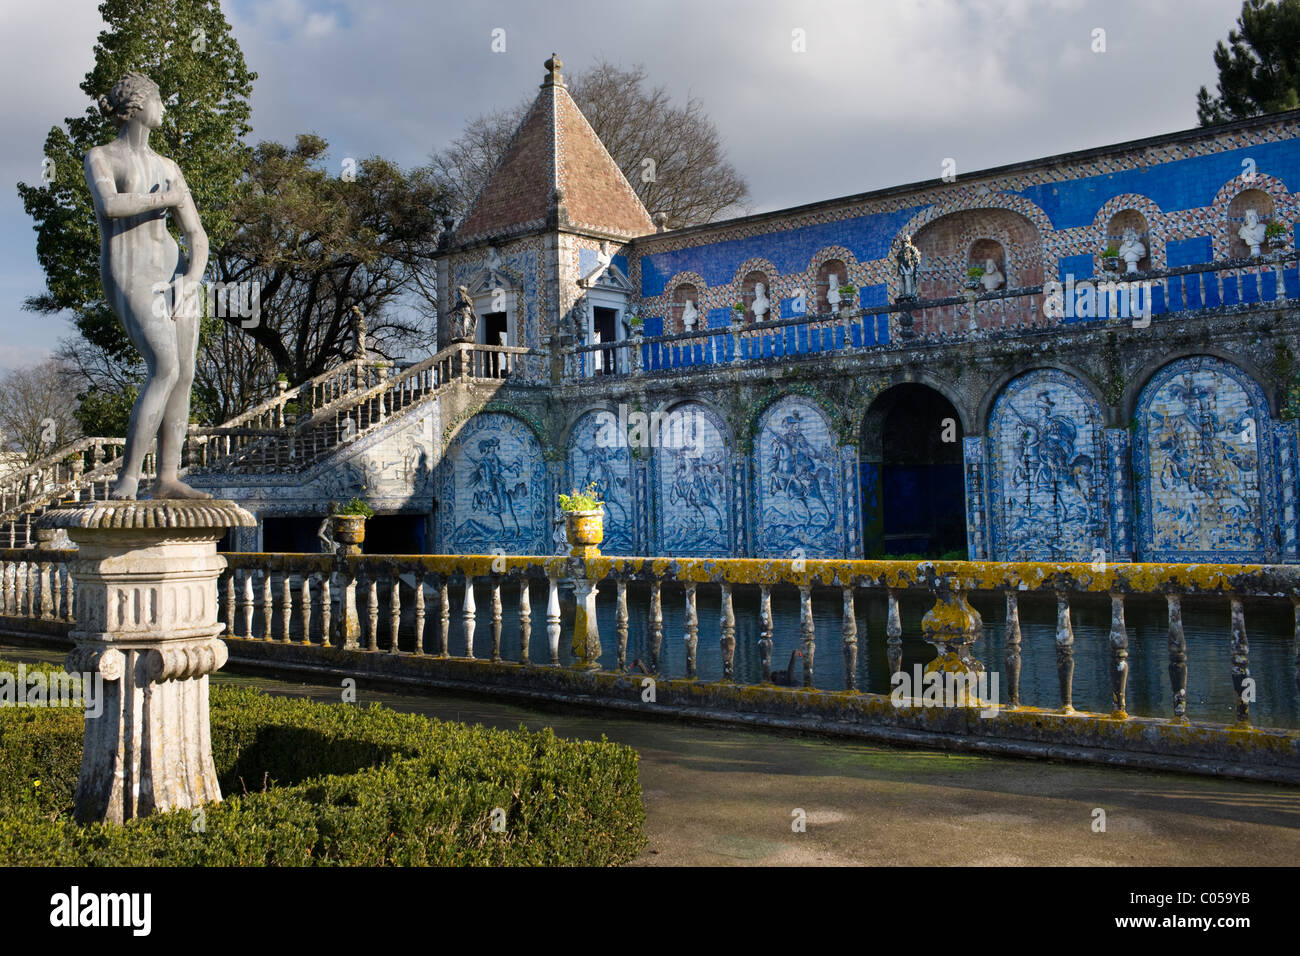 In the water garden at Palacio Fronteira, Lisbon, Portugal - Stock Image